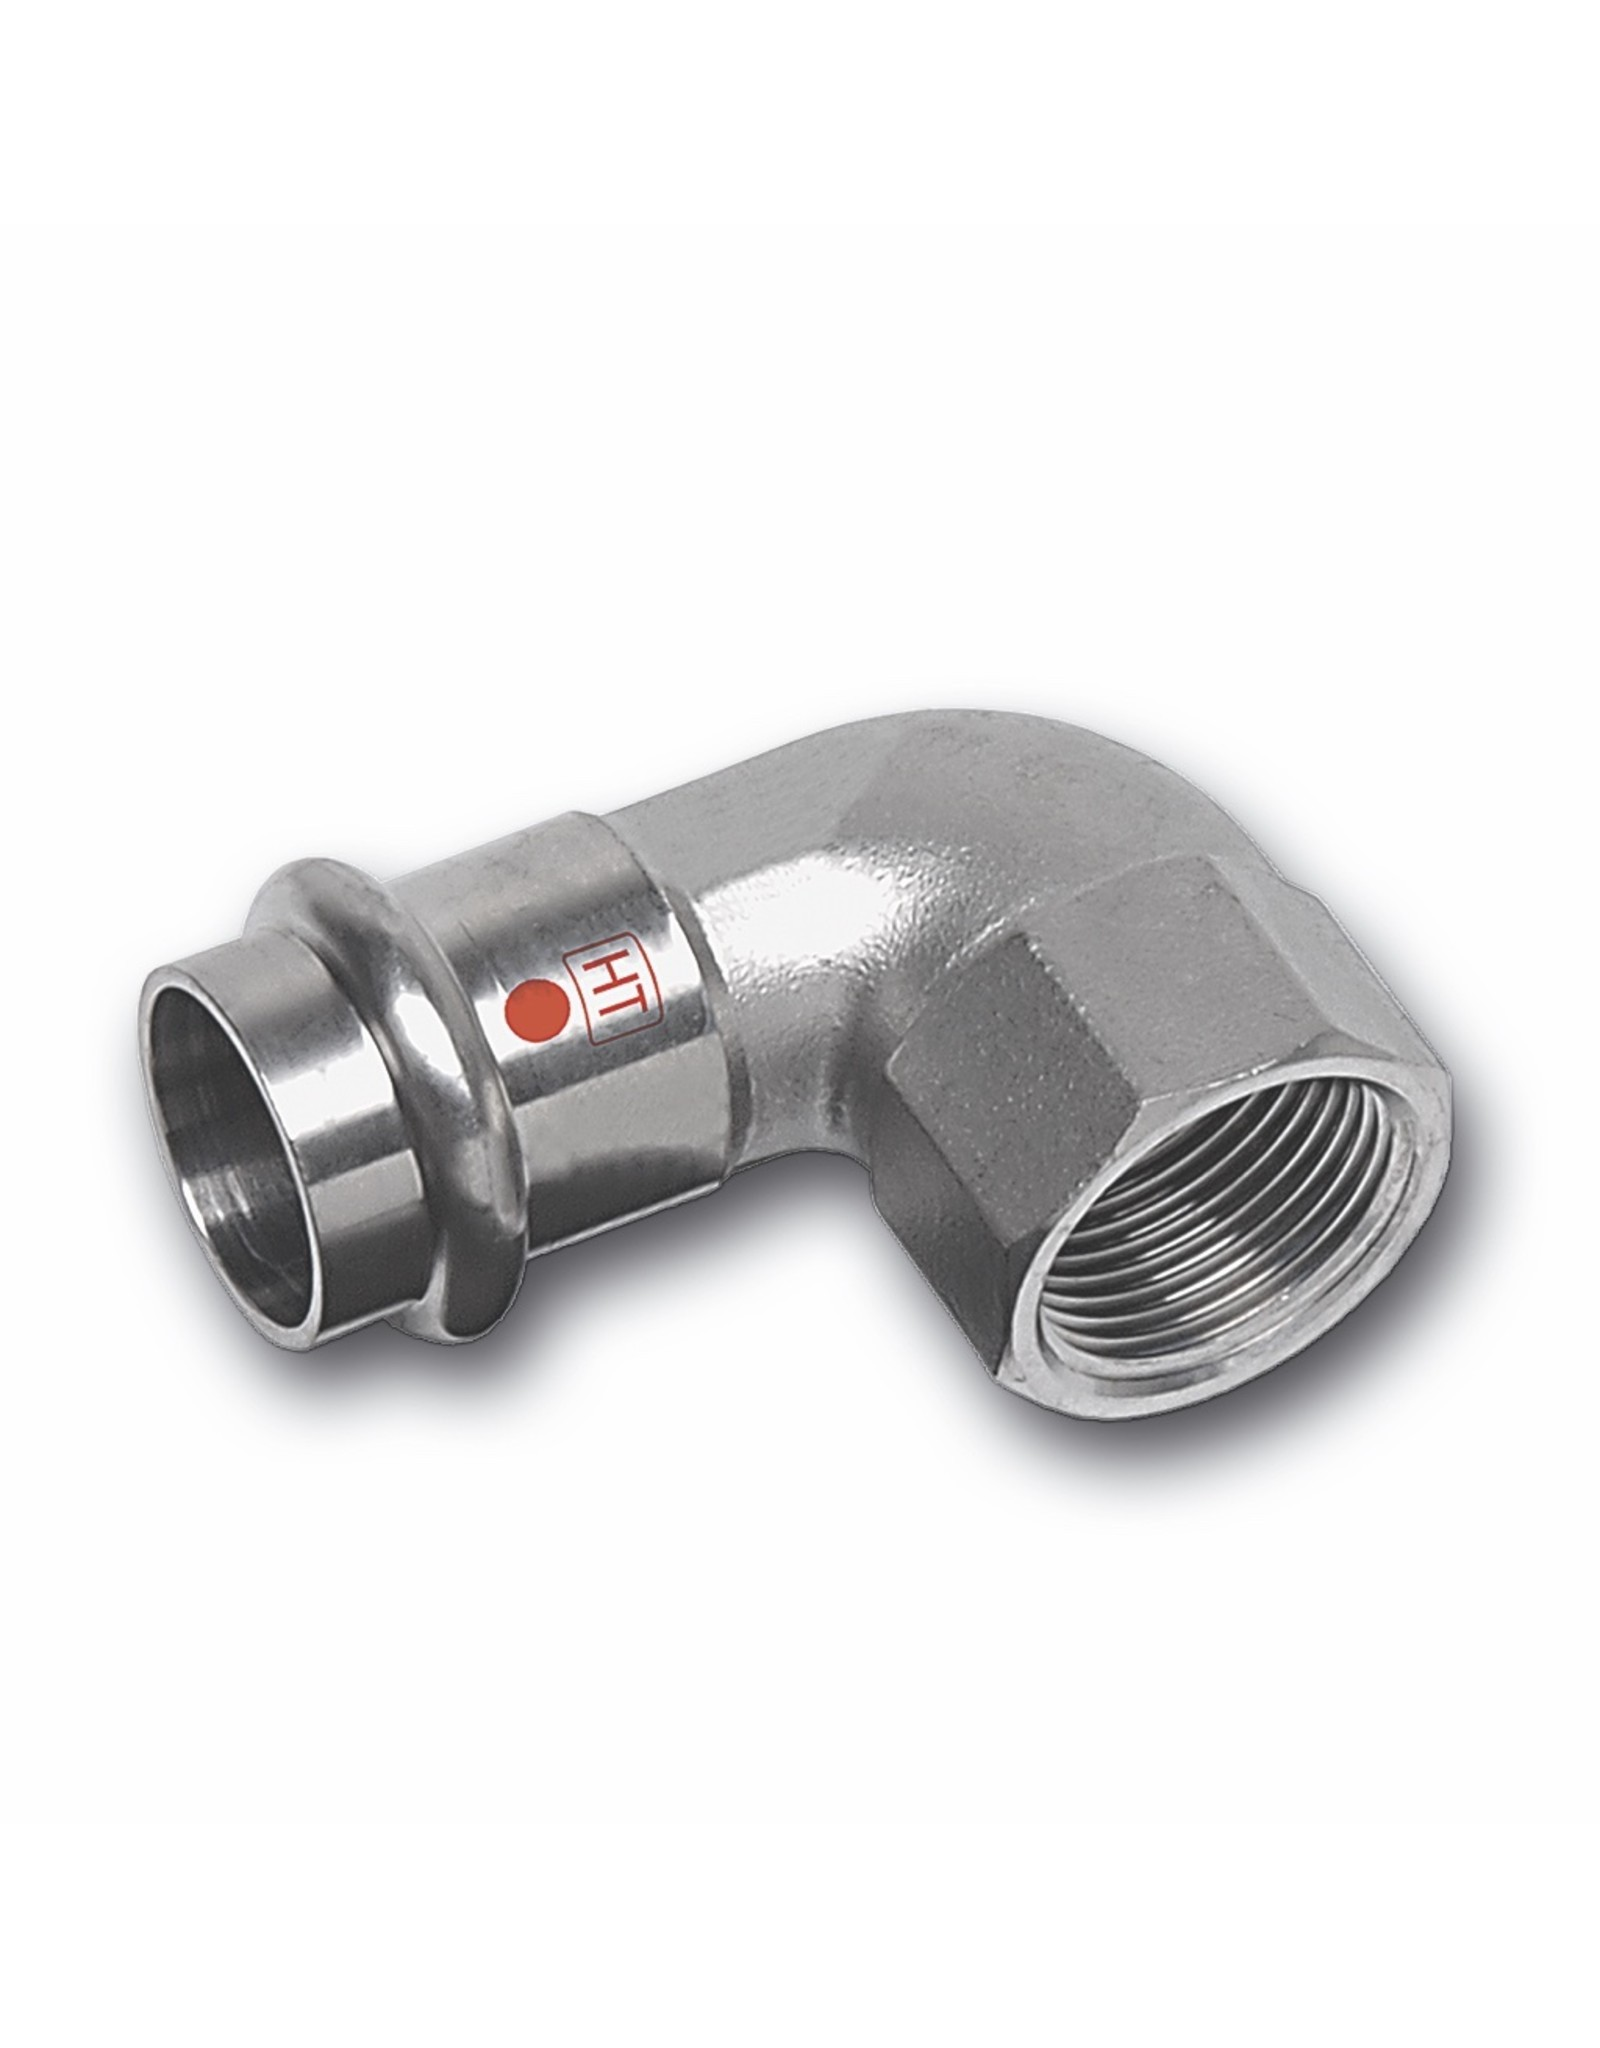 Nirotherm Industrie   knie 90°, 1M + binnendraad